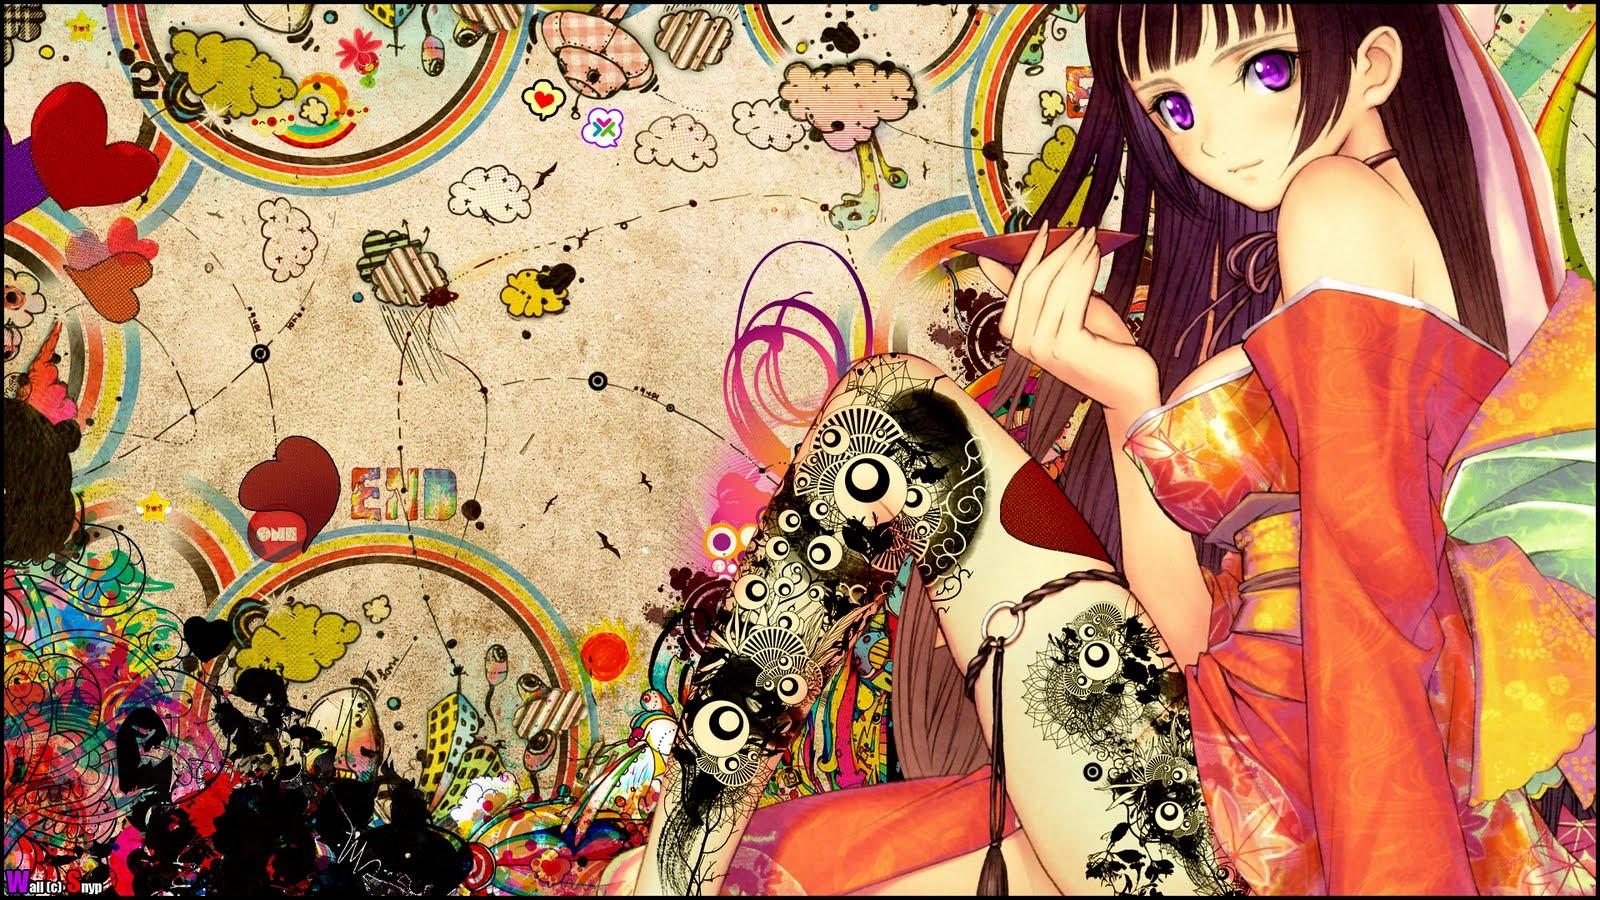 http://1.bp.blogspot.com/-83NPHogQKRg/TlBaTikykfI/AAAAAAAAAEw/PjoGXxjhrCQ/s1600/Konachan.com+-+97141+clouds+japanese_clothes+kimono+rainbow+taka_tony+tattoo.jpg